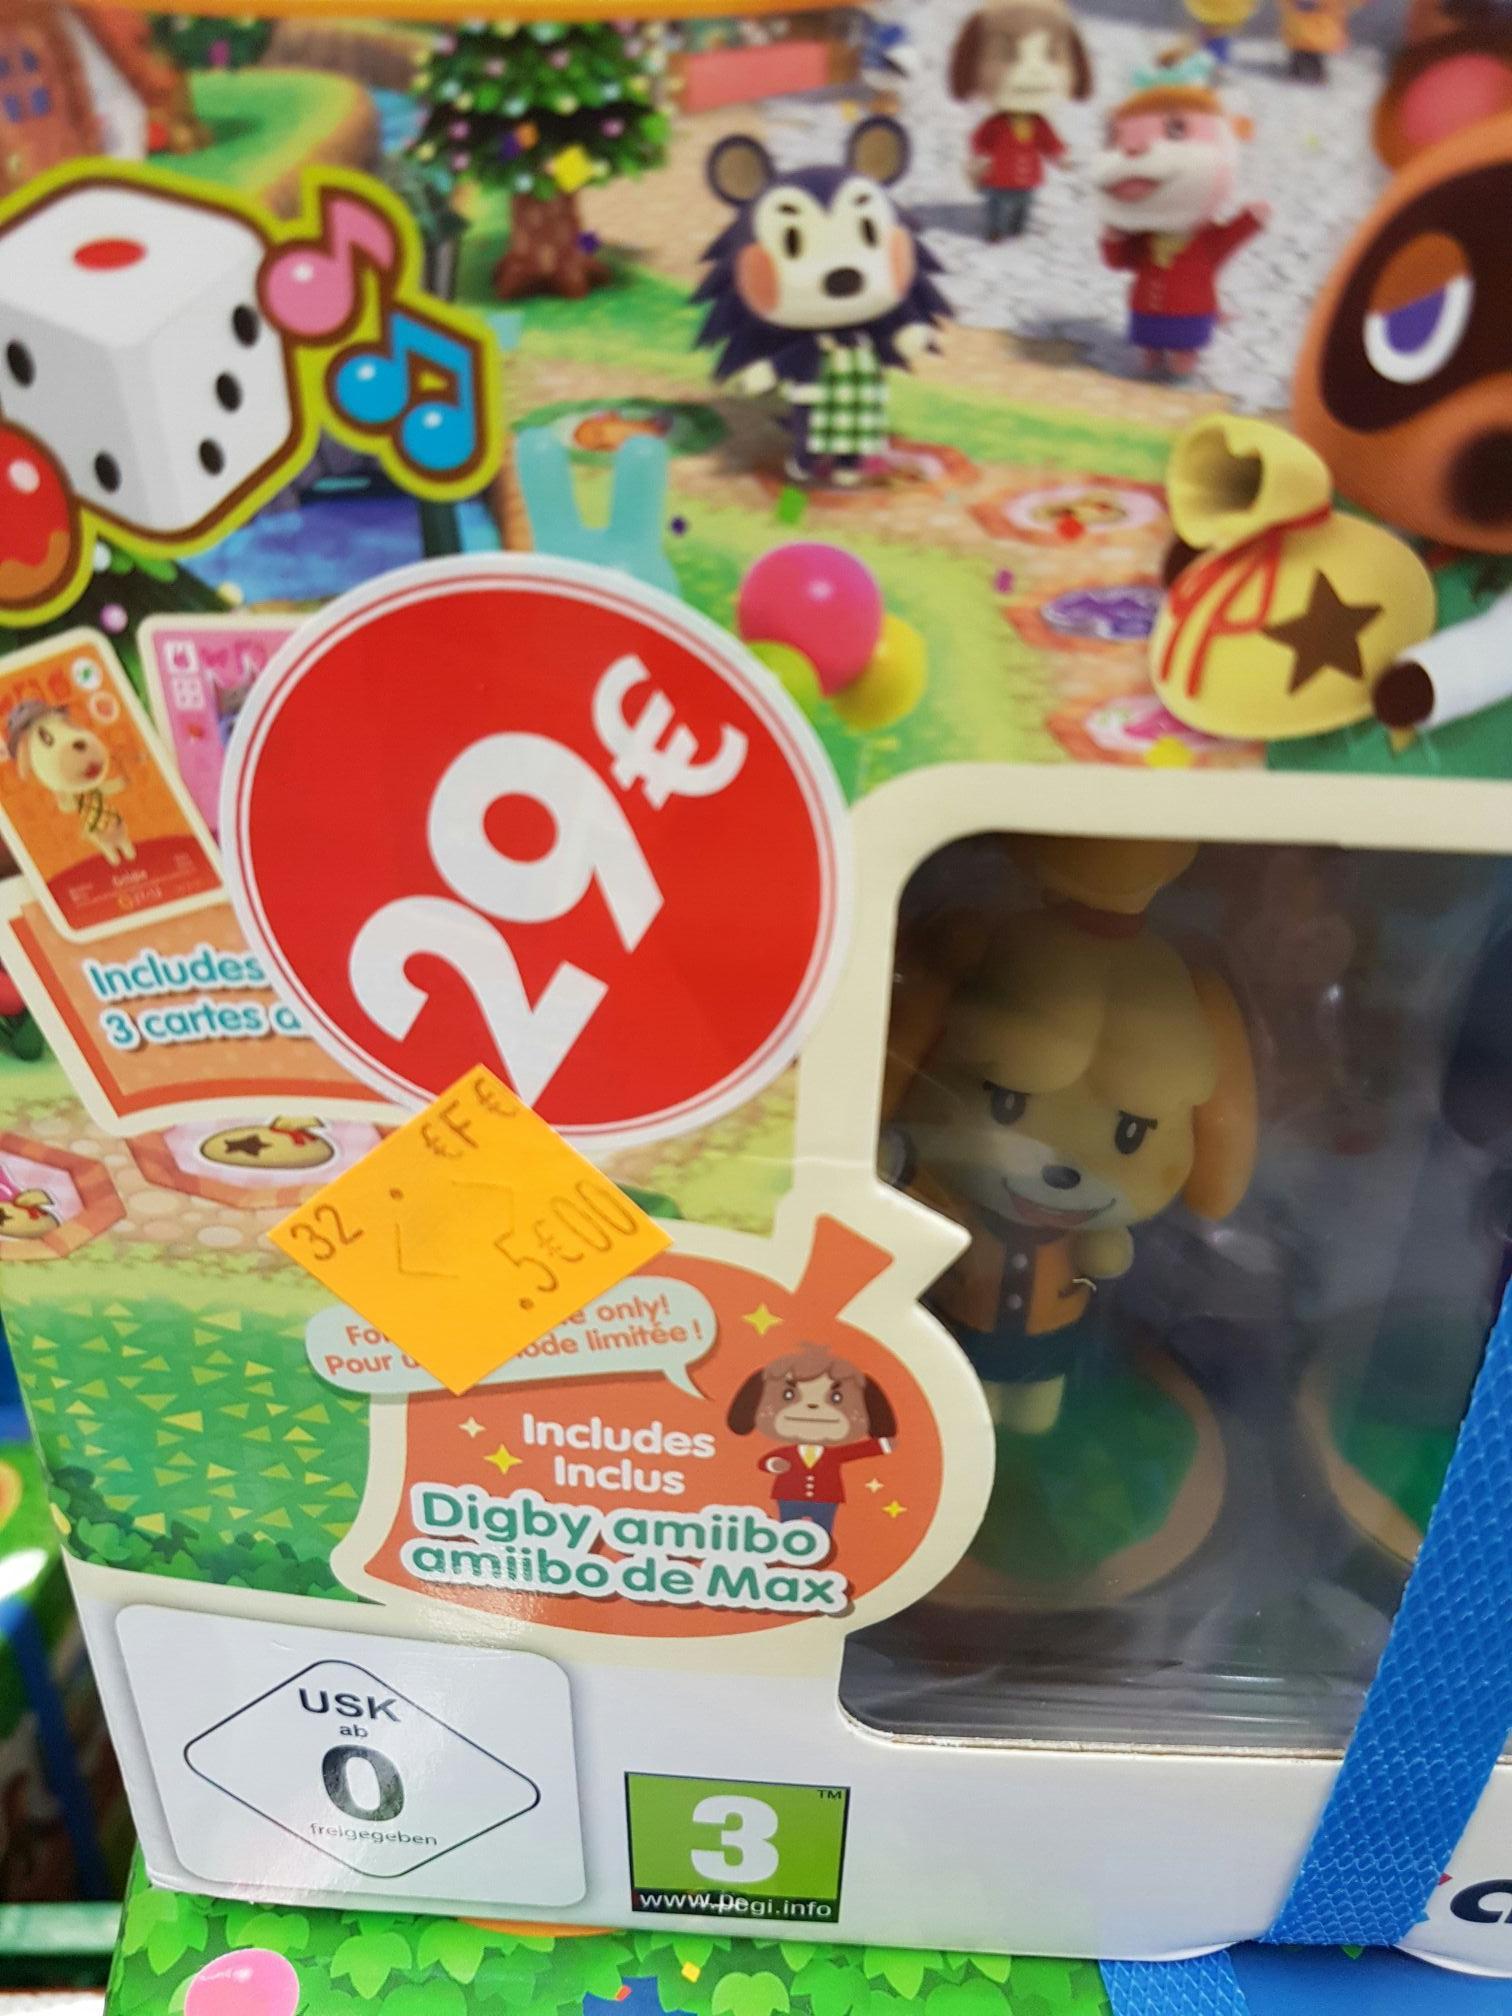 Animal Crossing : Amiibo Festival - Edition Limitée (2 Amiibo + 3 cartes) sur Wii U